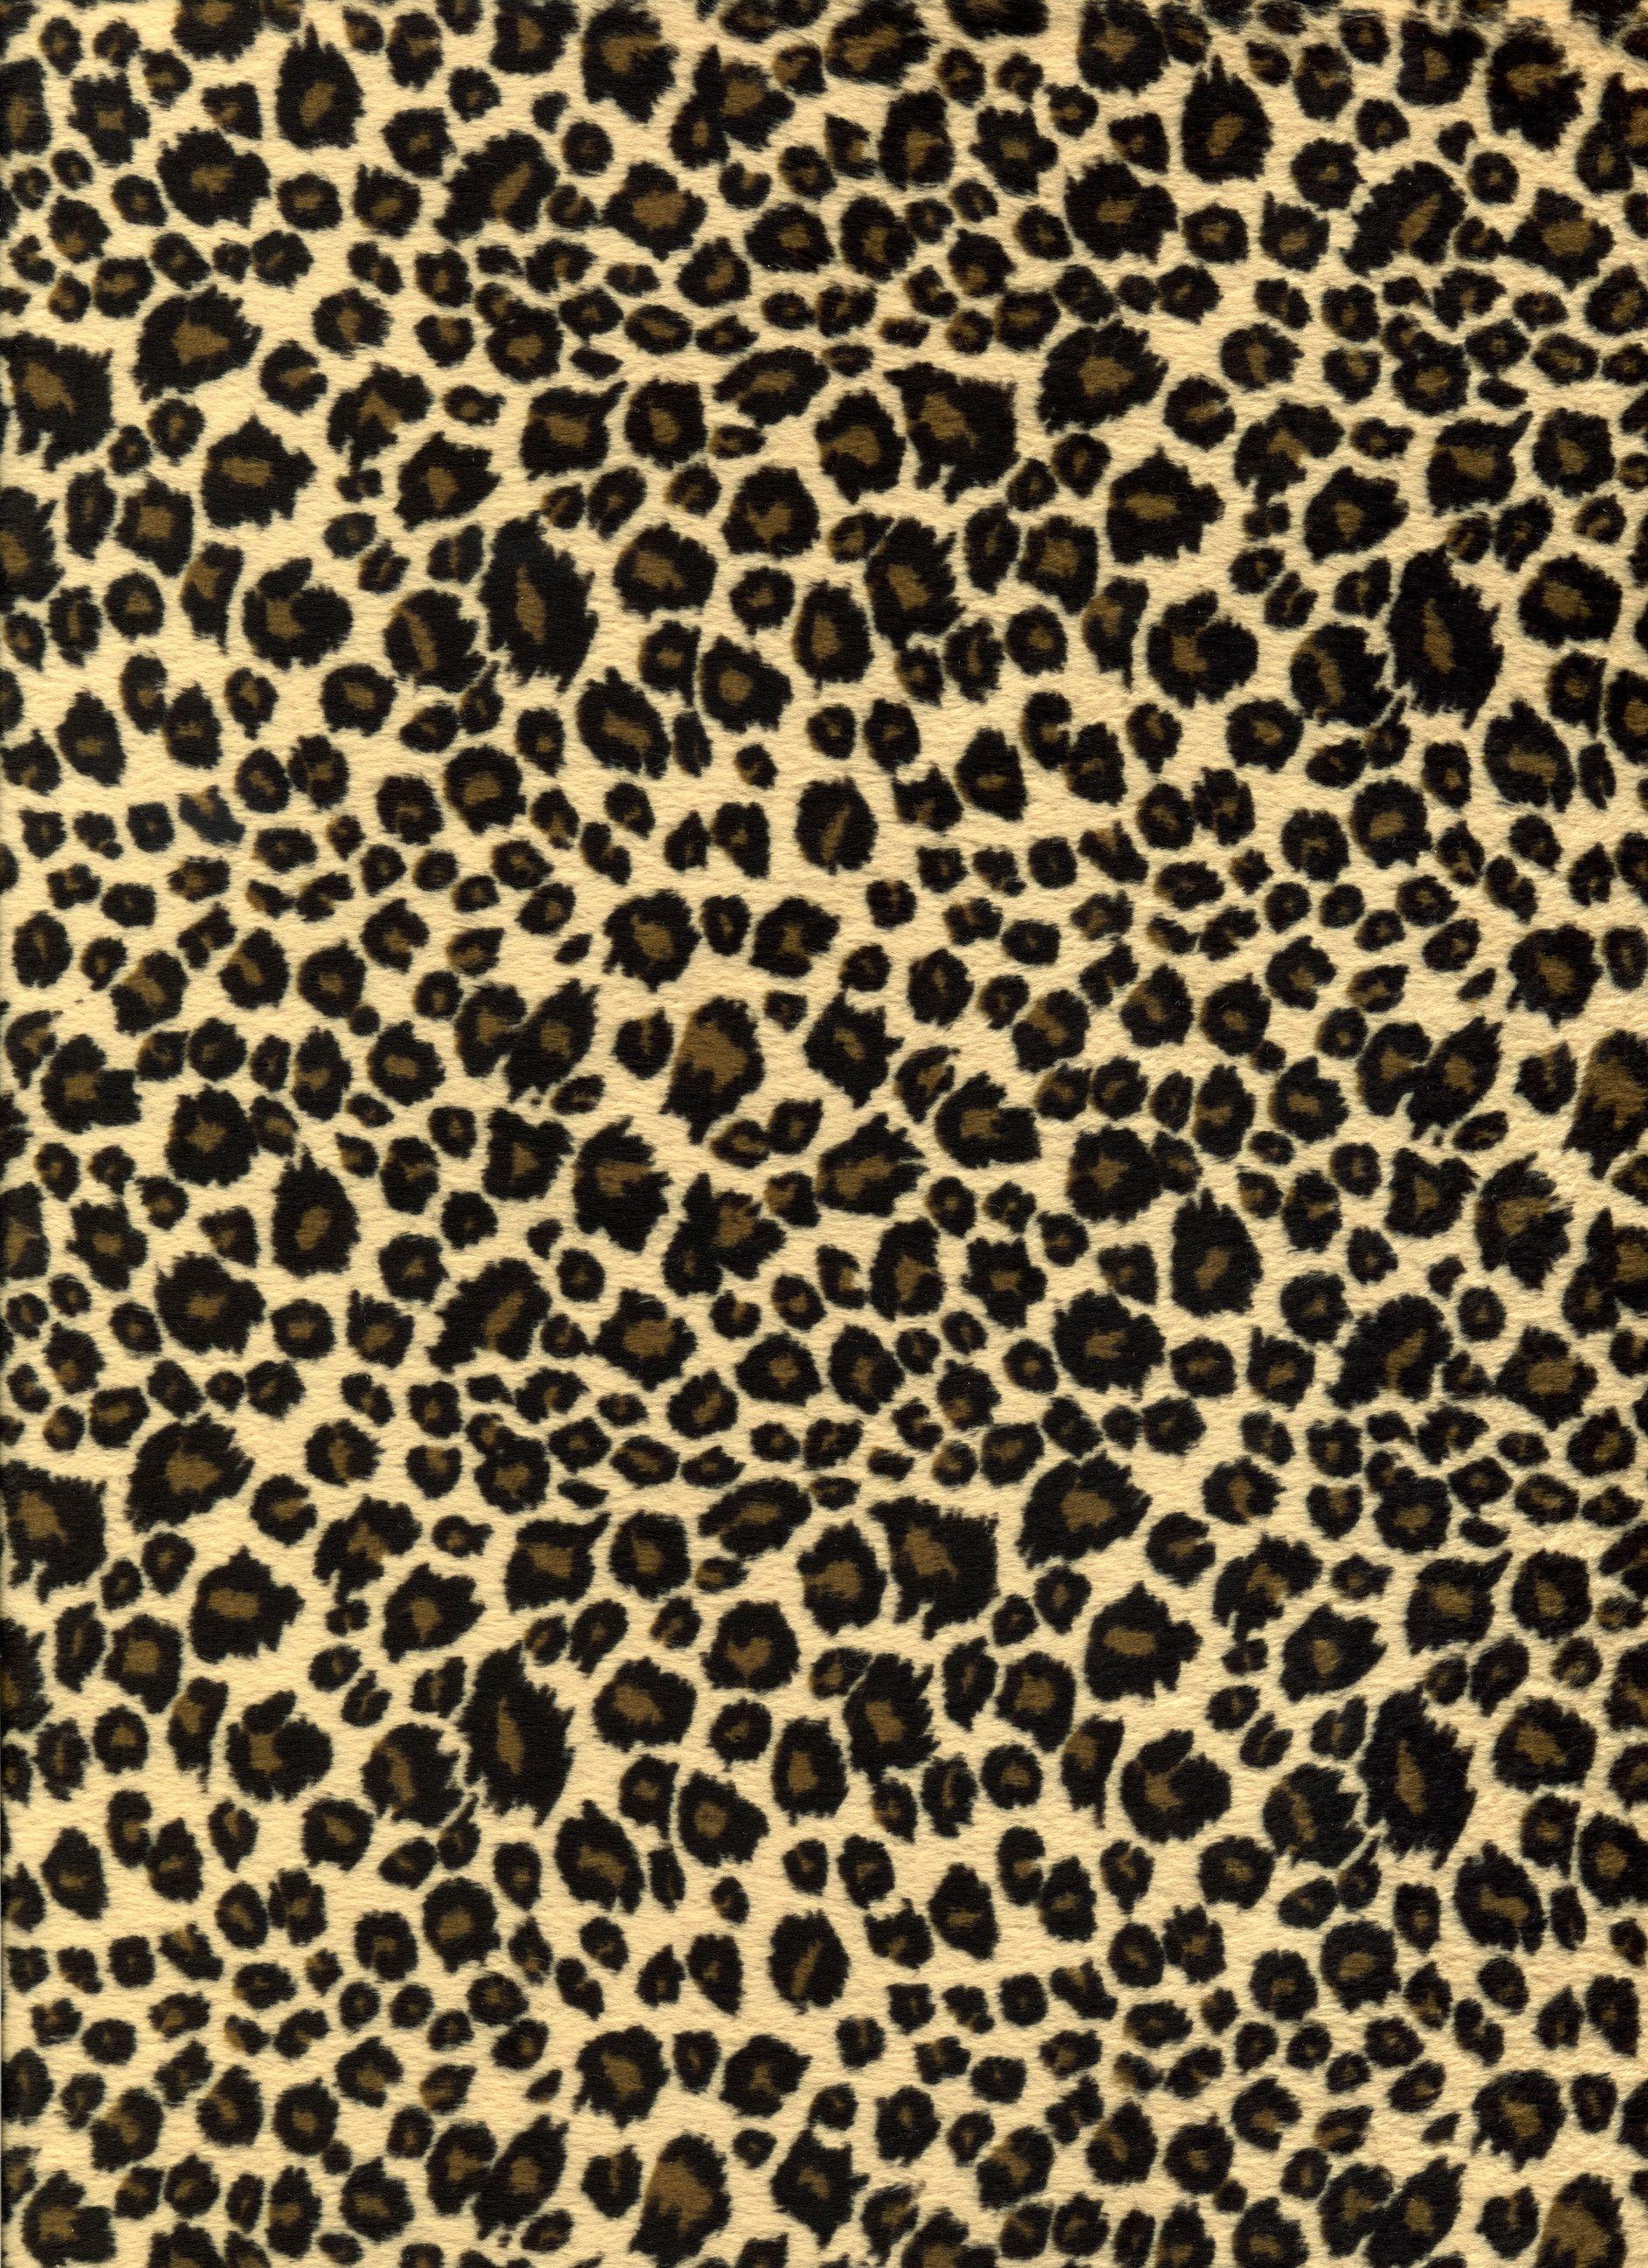 Cheetah Print Wallpapers Top Free Cheetah Print Backgrounds Wallpaperaccess